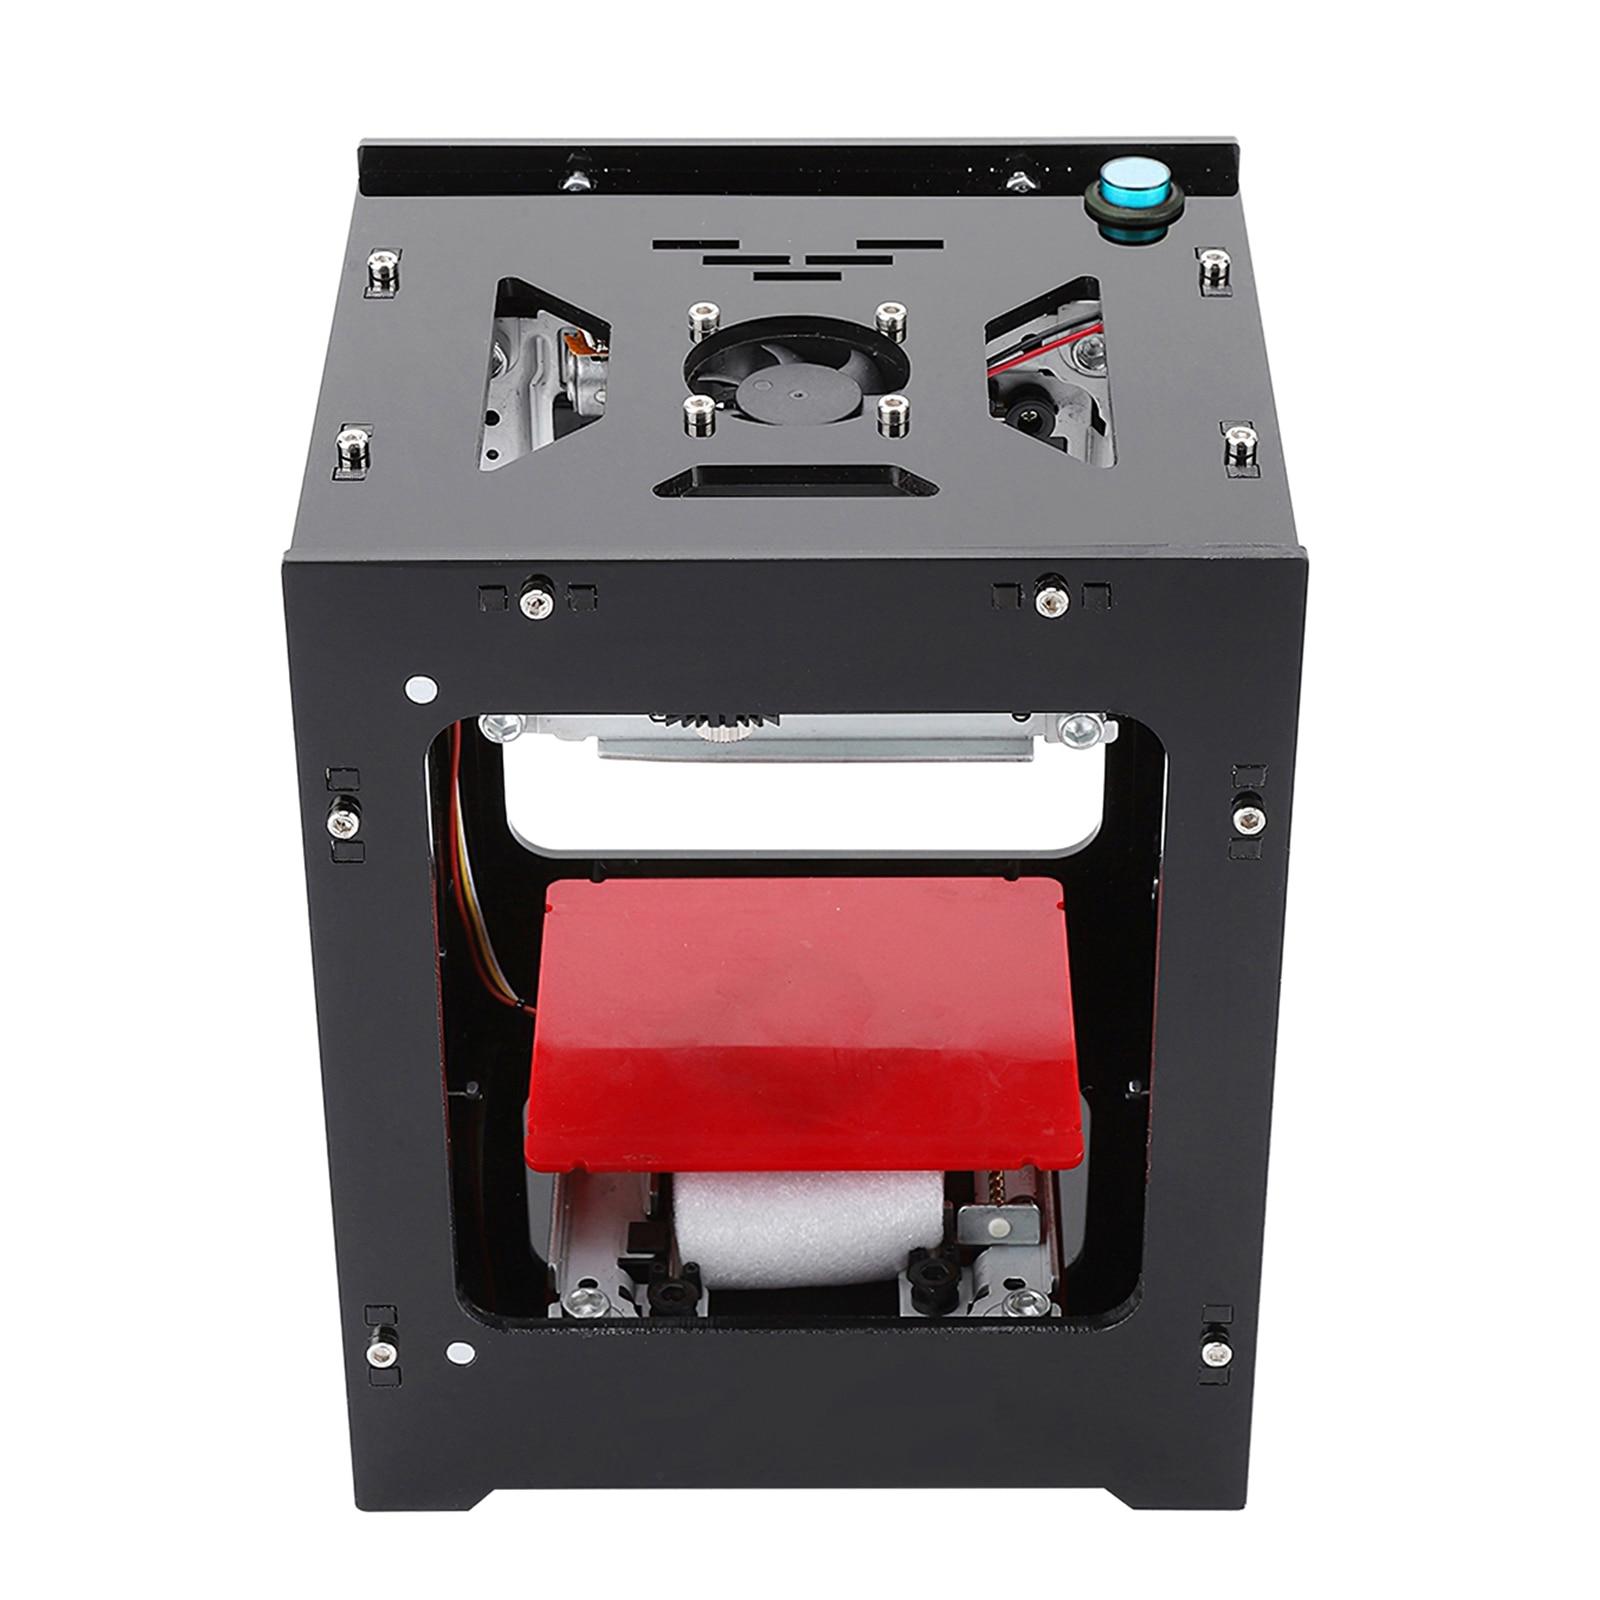 NEJE DK-BL 3000mW 445nm Bluetooth USB Laser Engraver Carver Auto DIY Print Cutting Carver Engraving Machine Off-line Operation enlarge